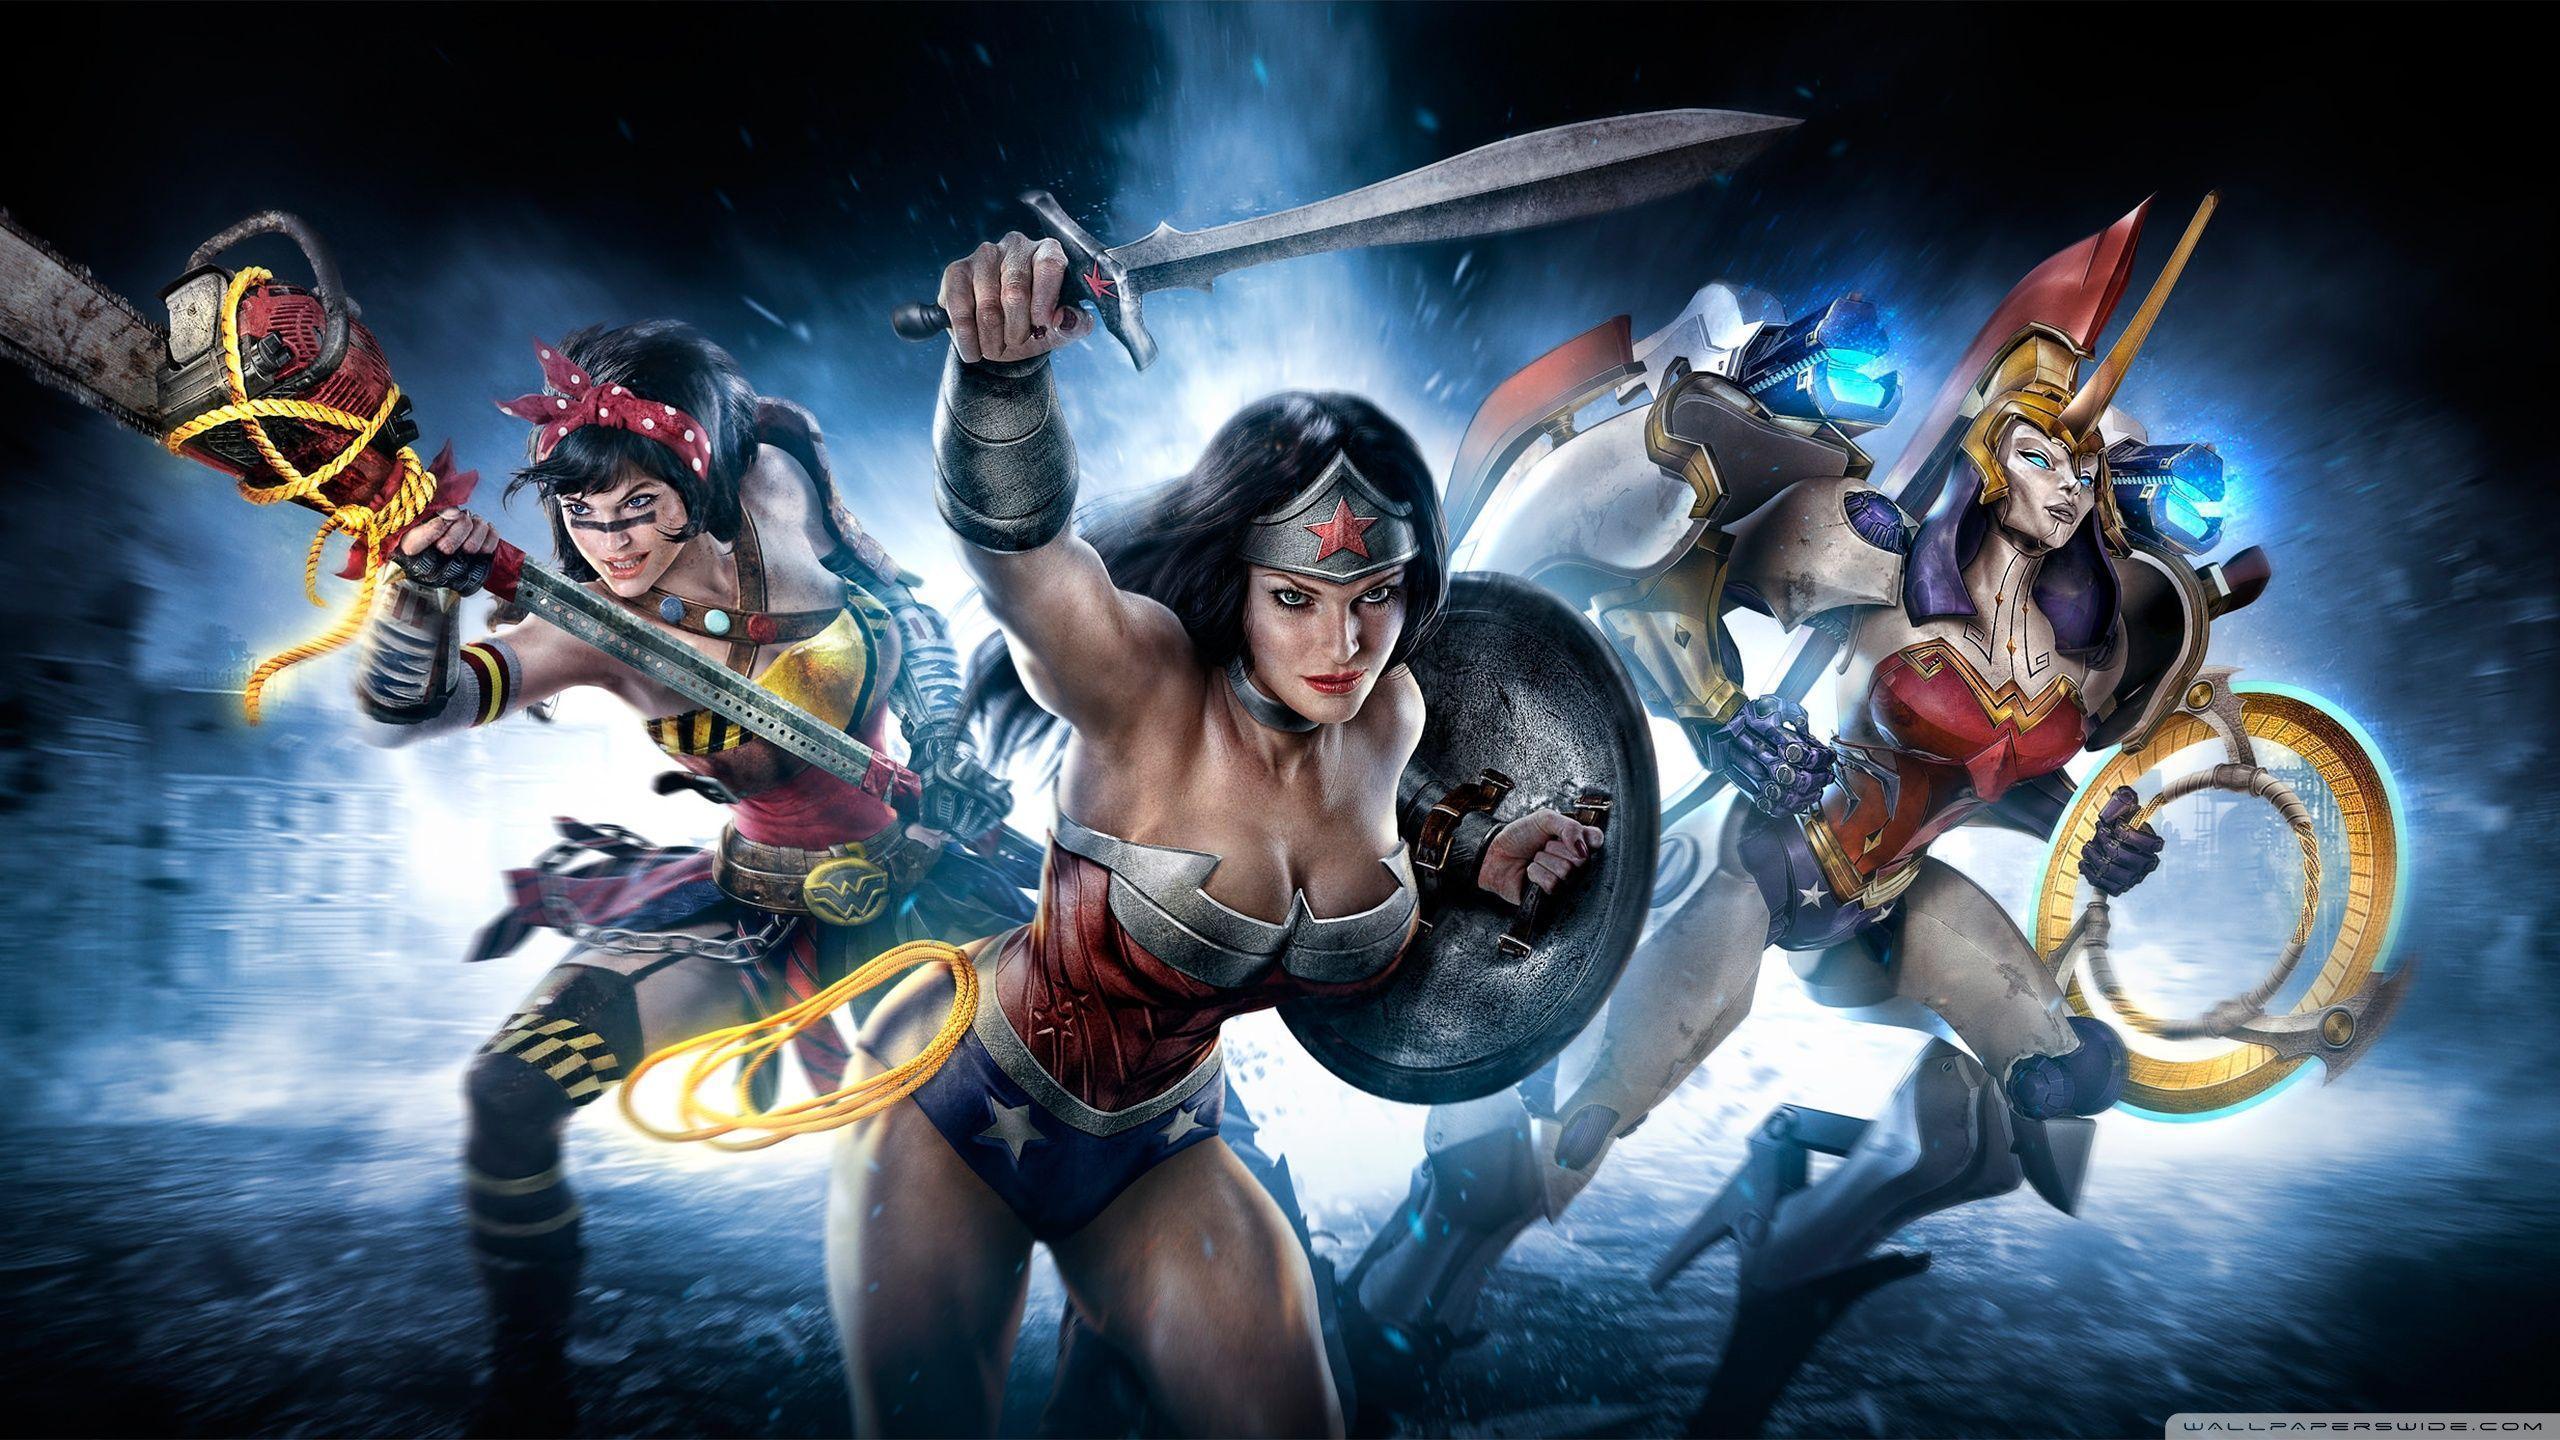 Wonder Woman HD desktop wallpaper : Dual Monitor